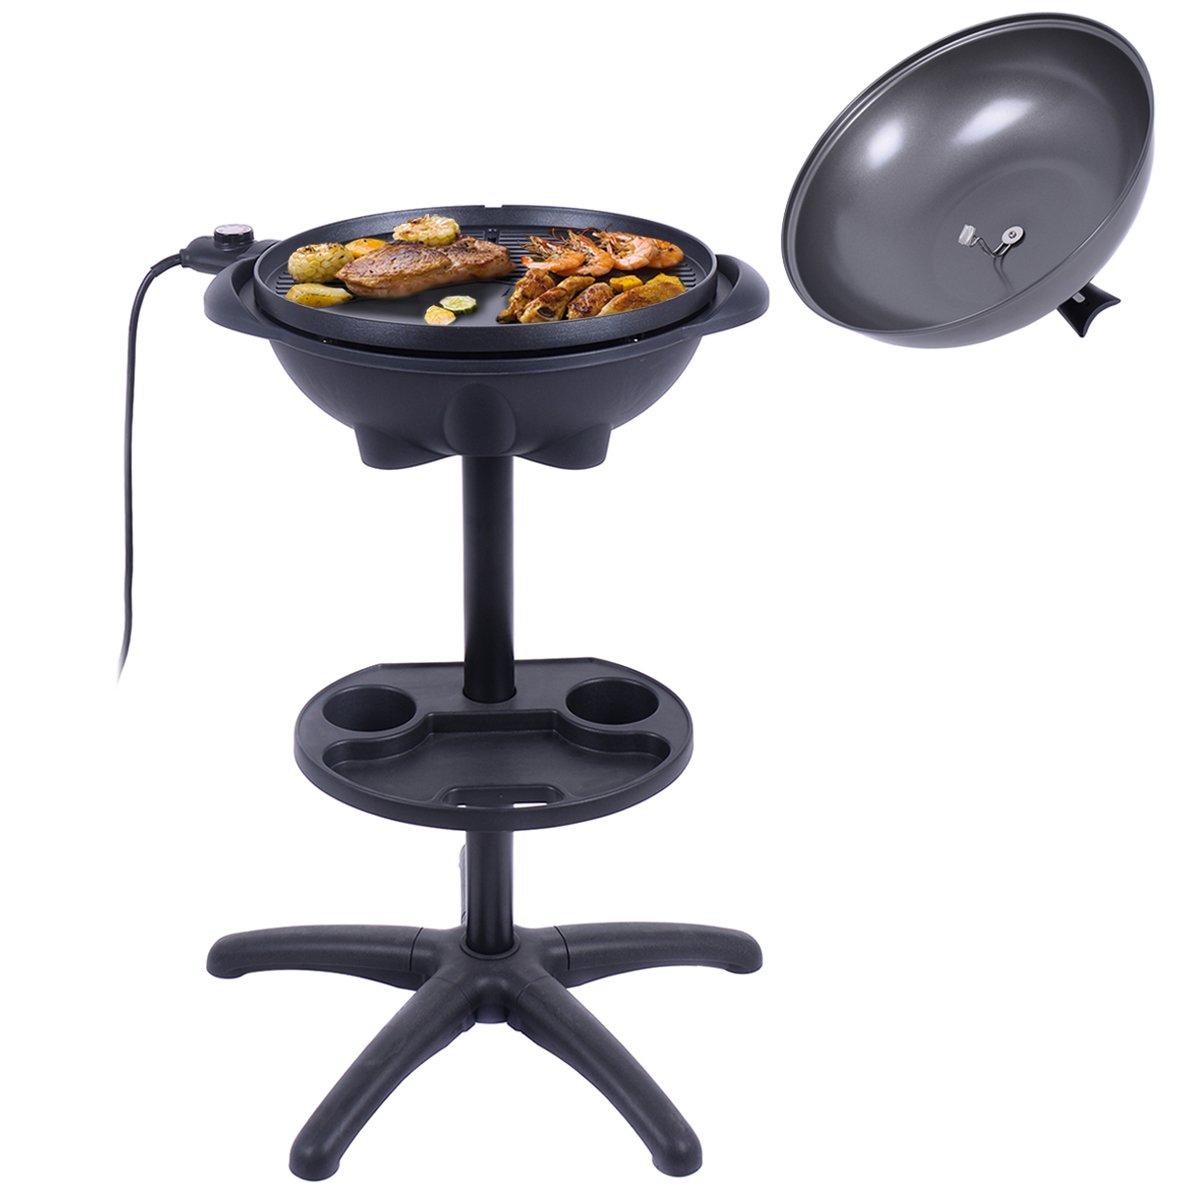 COSTWAY 1350W Indoor/Outdoor Electric BBQ Grill, Black by COSTWAY (Image #3)